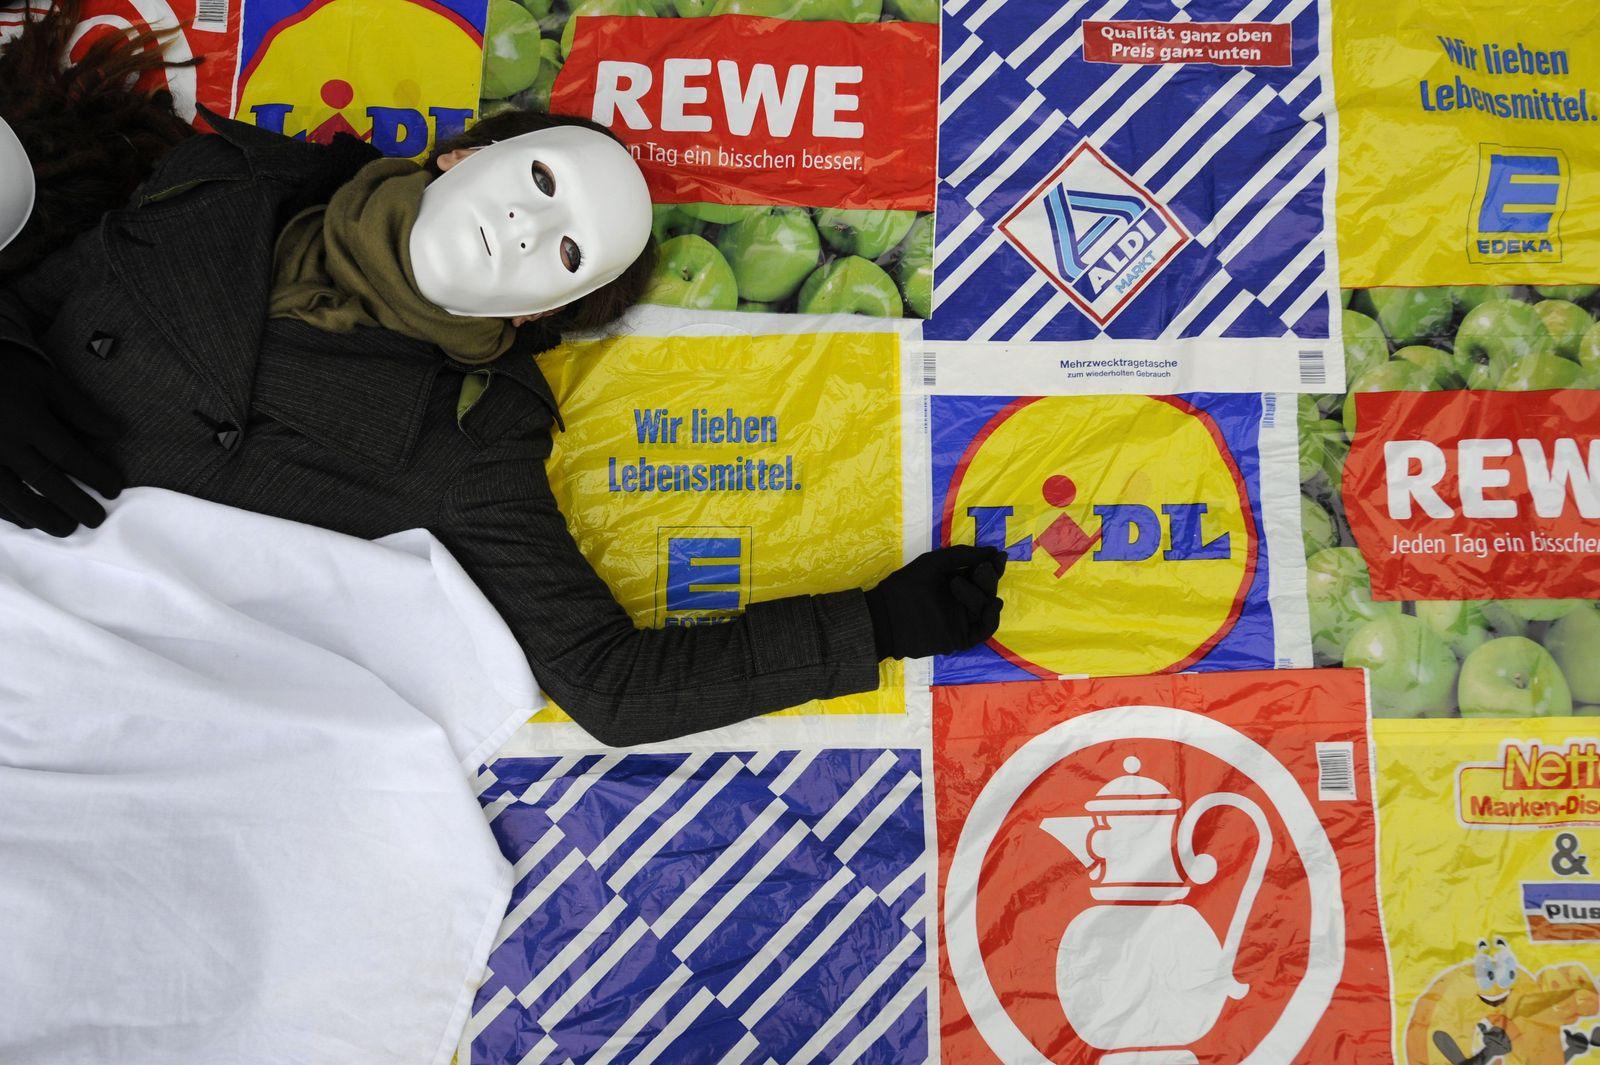 GERMANY-SOCIAL-PROTEST-SUPERMARKET